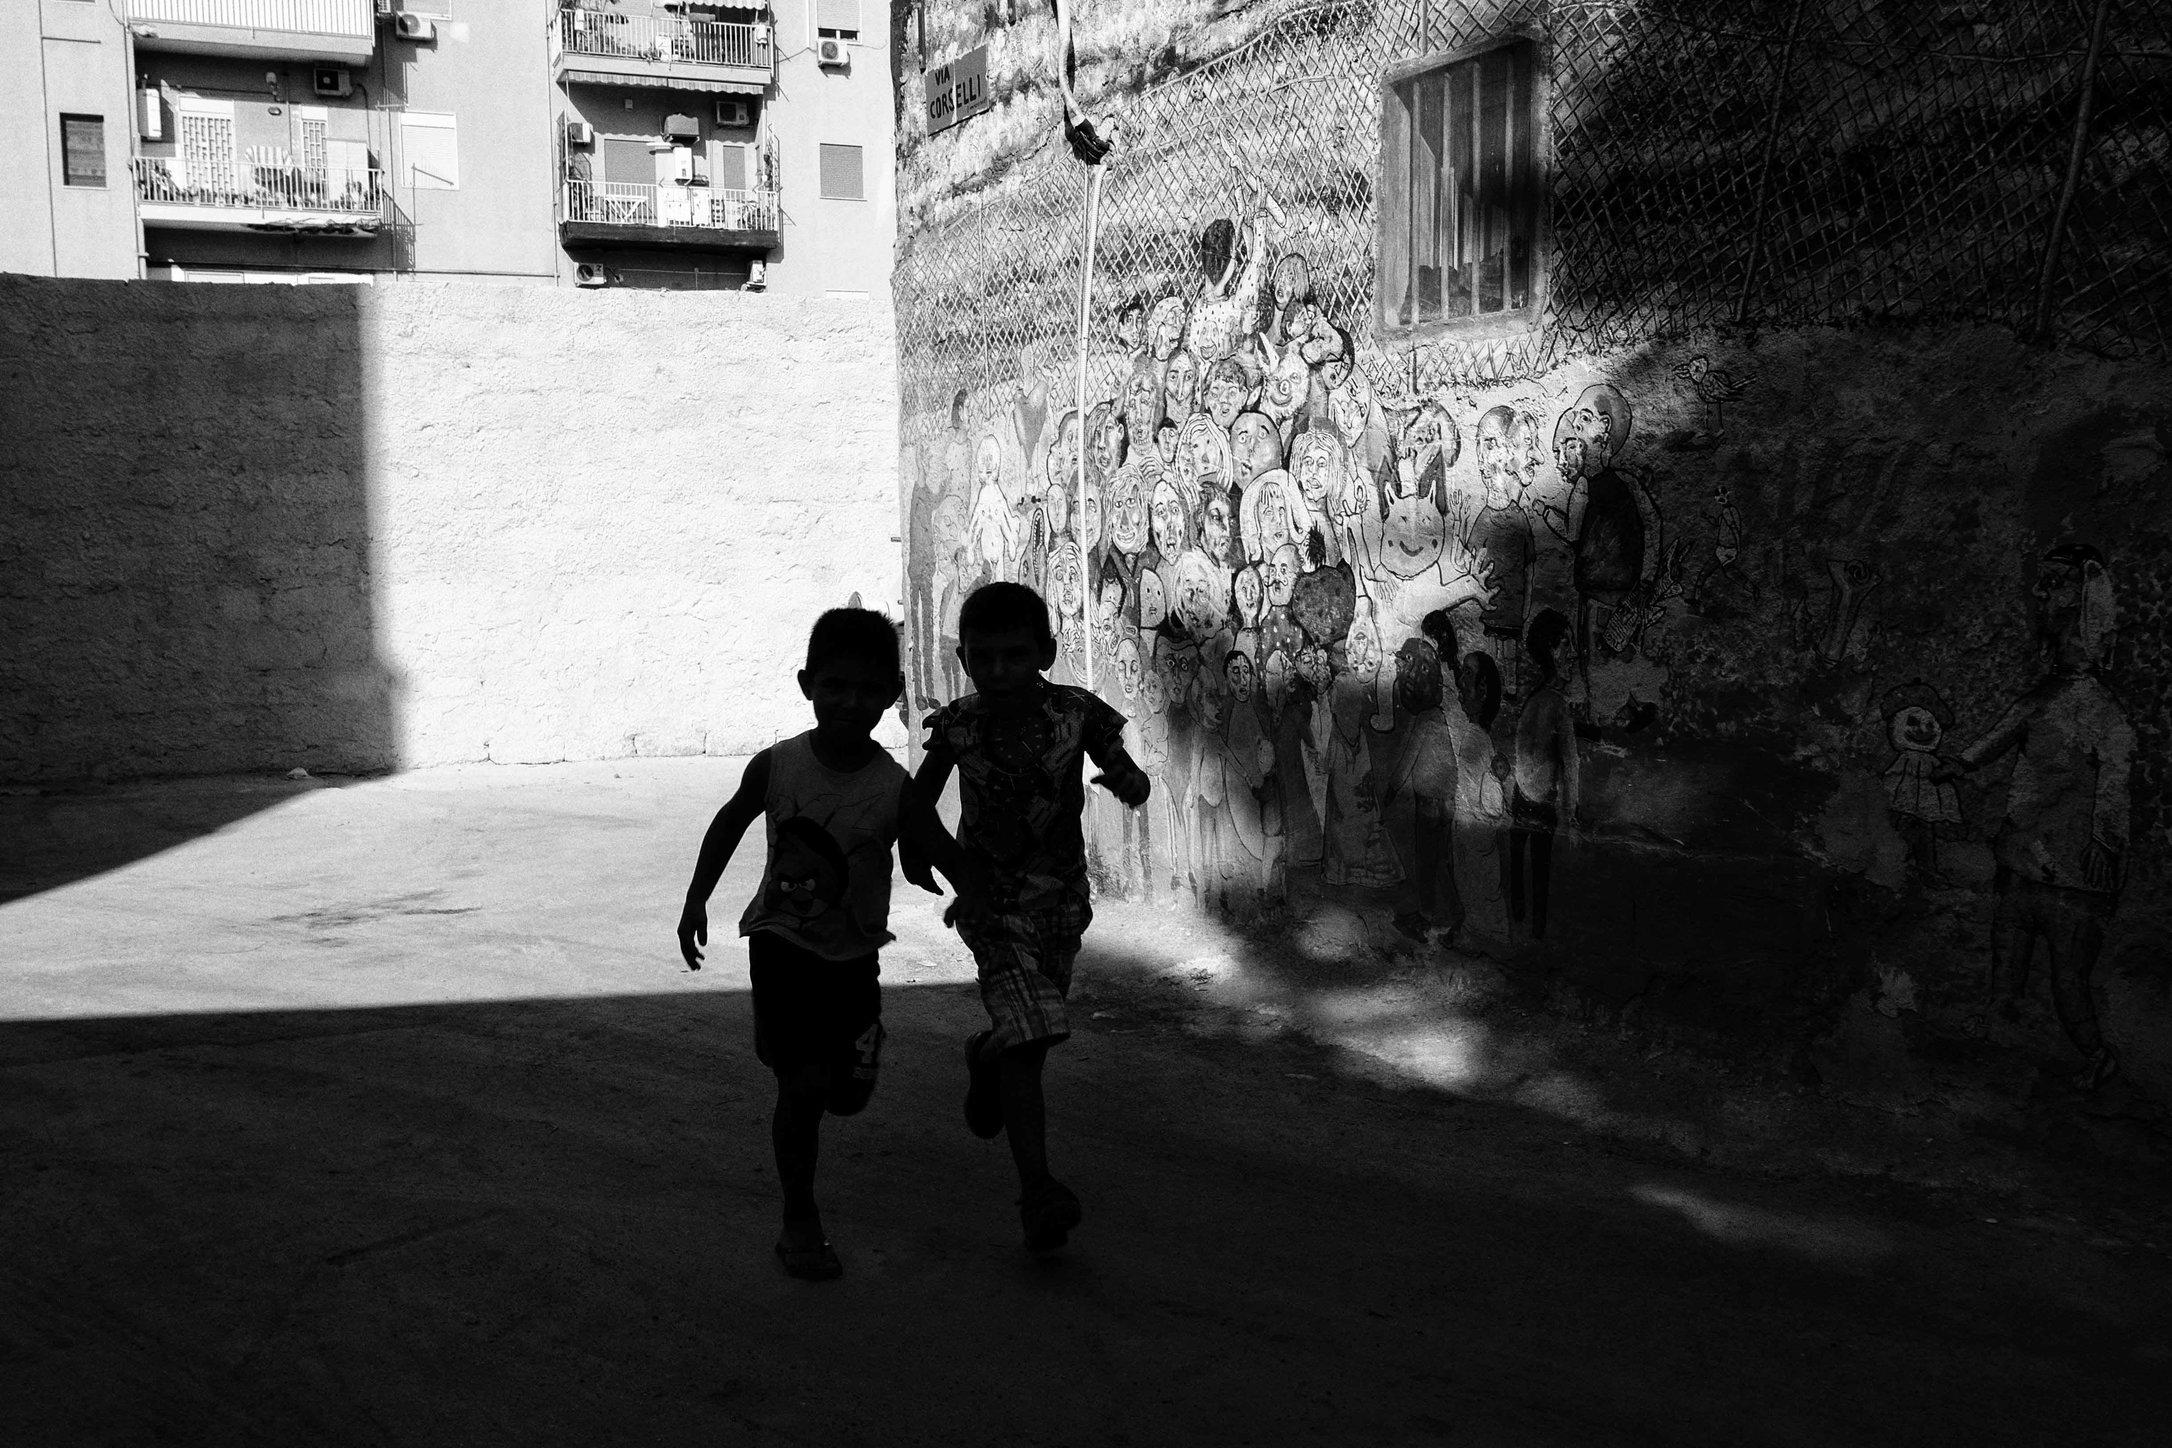 myownlens_streetphotography_palermo__chimenti_02.jpg